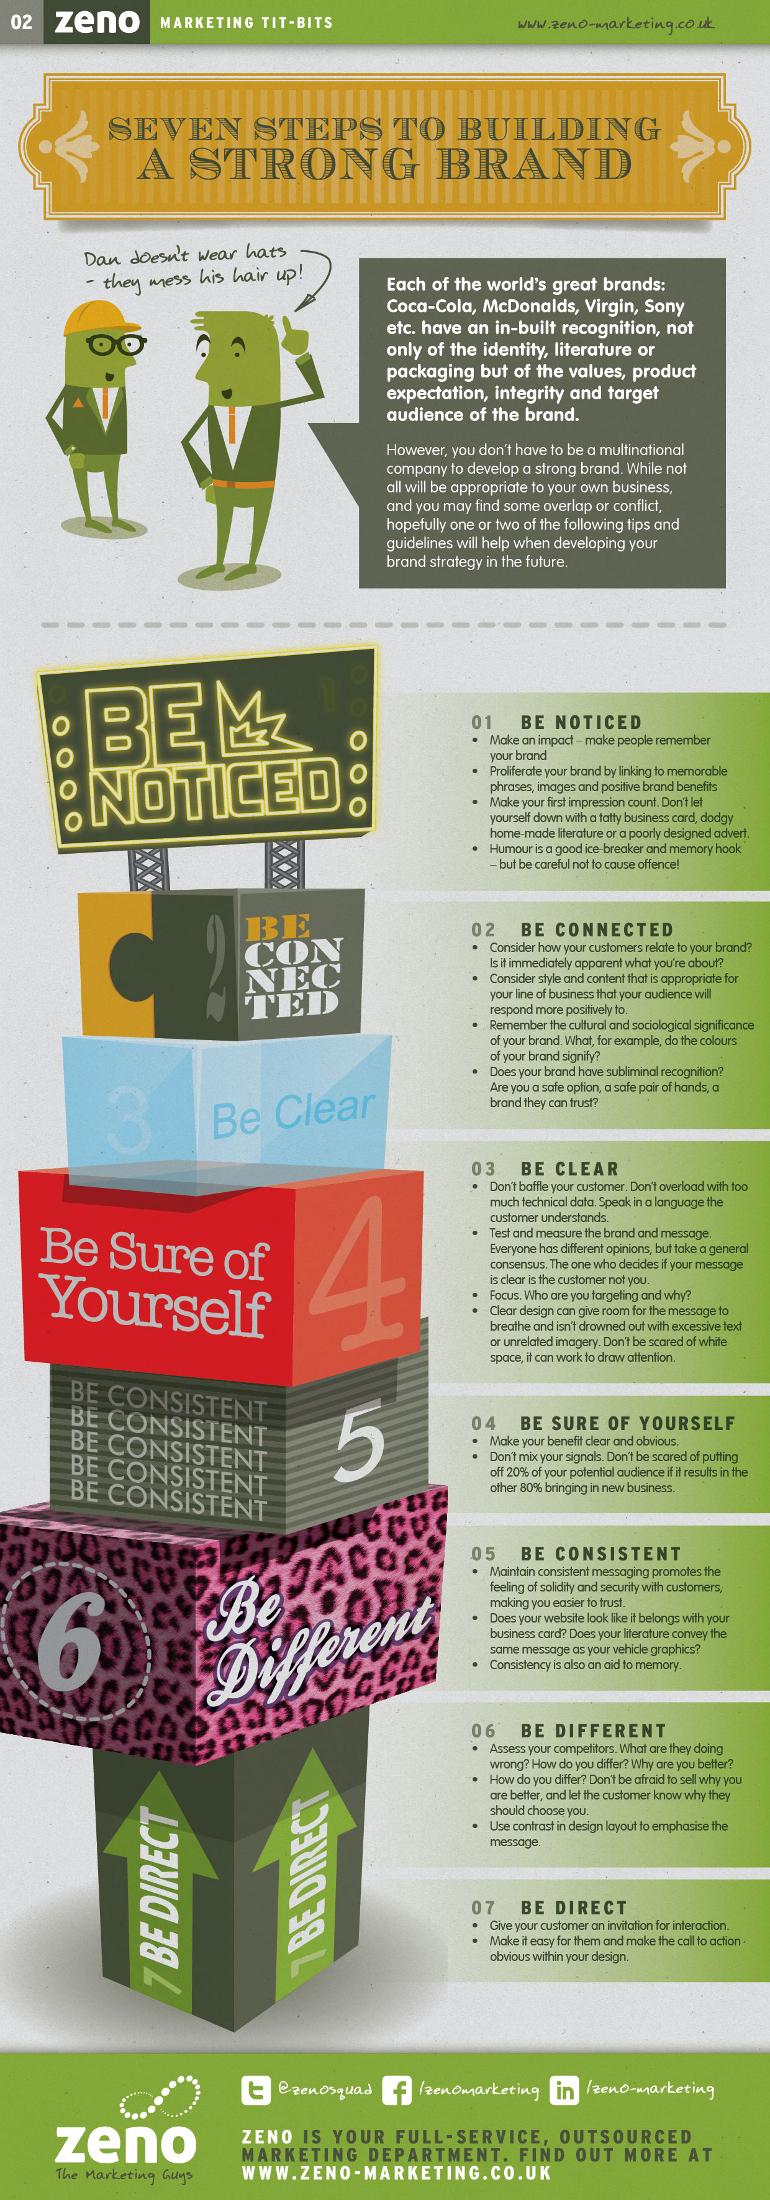 7 Great Ways to Improve and Build Brand Awareness